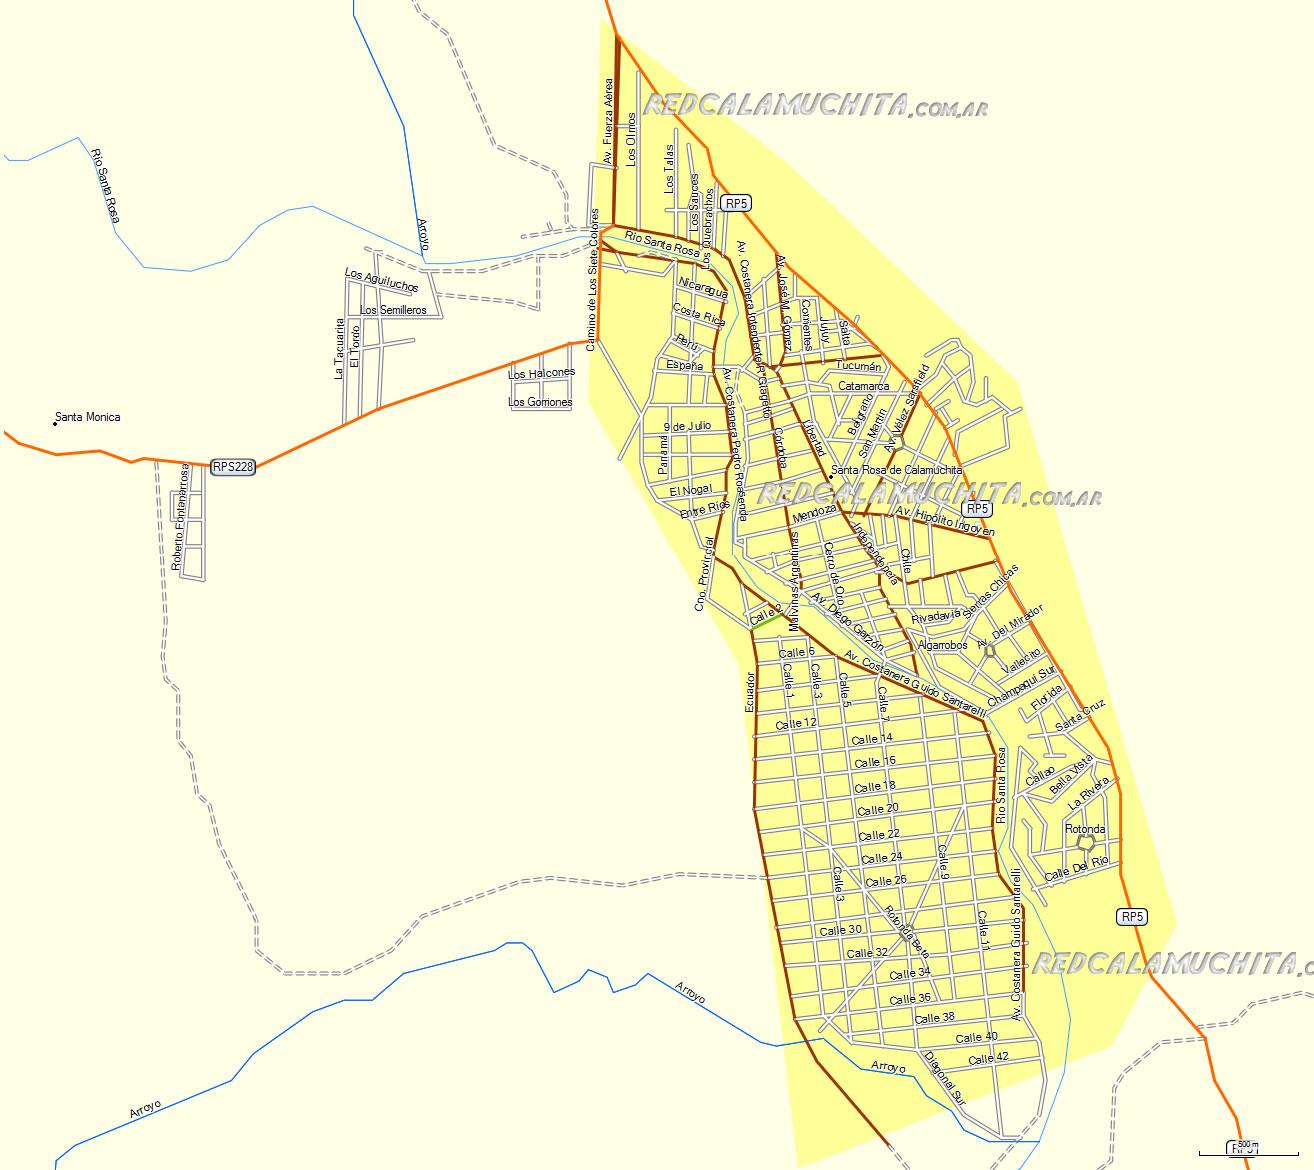 Mapa de Santa Rosa de Calamuchita Cordoba